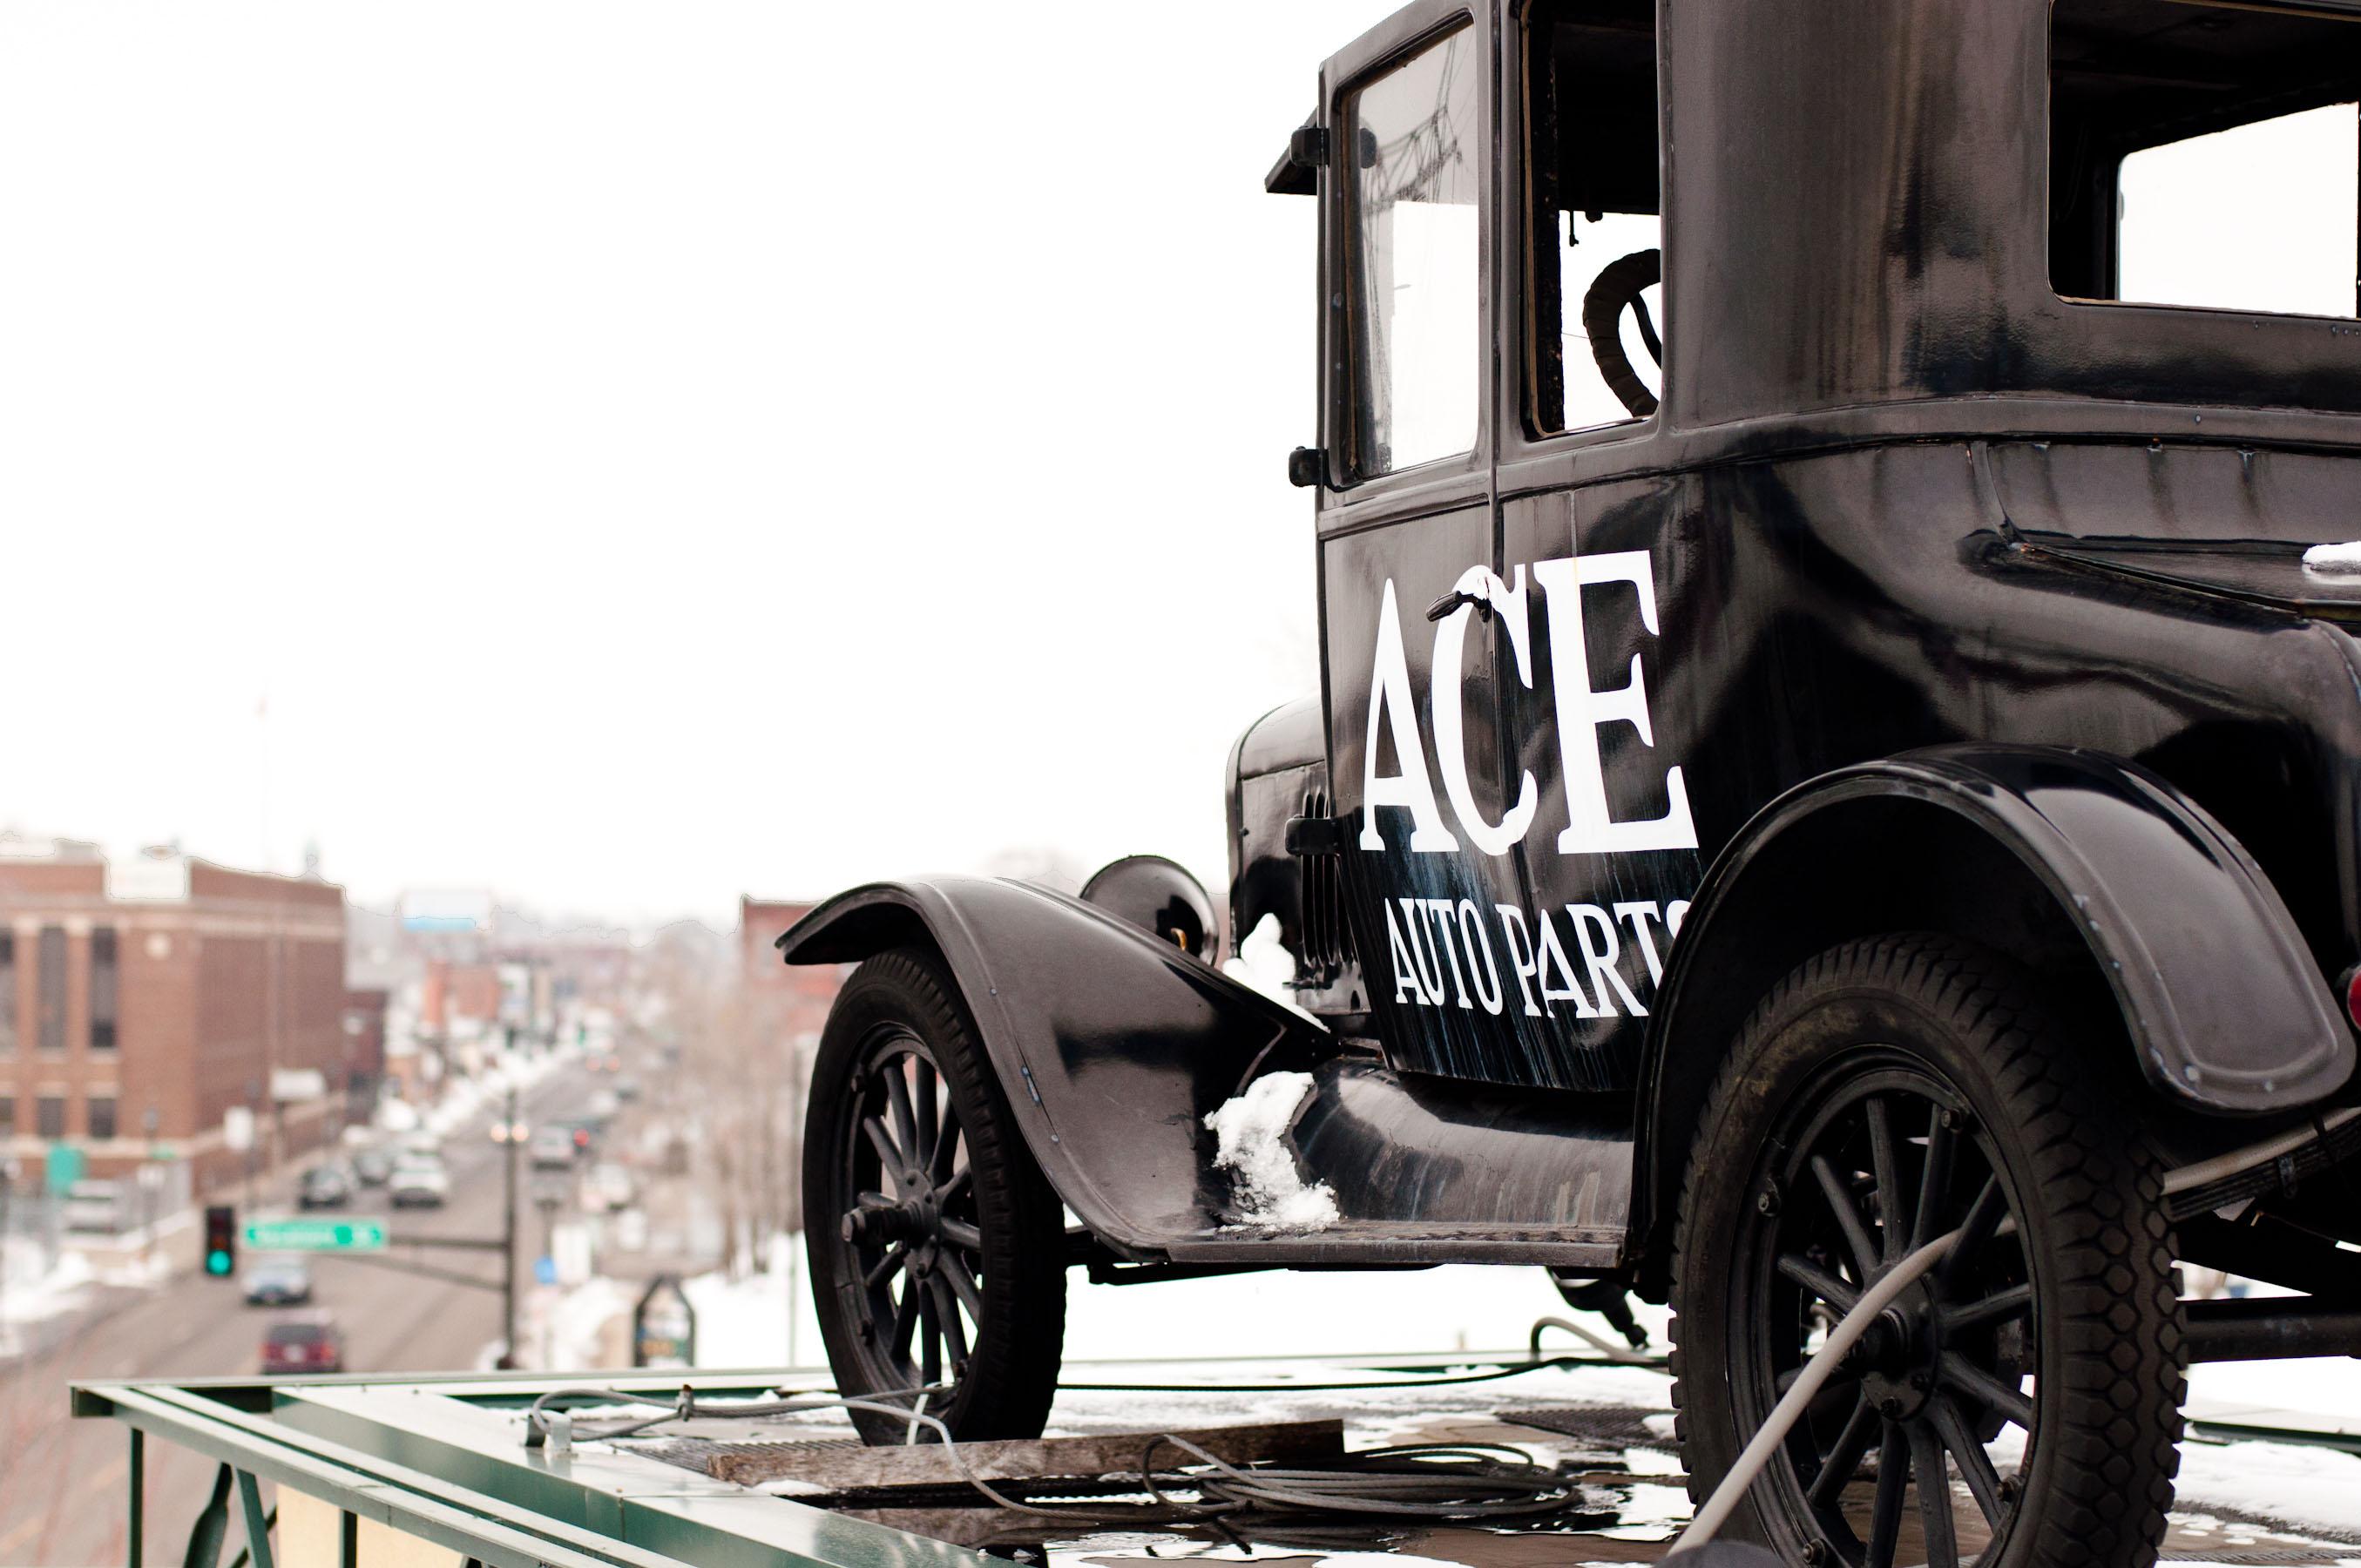 Ace Auto Parts Donates Space For Community Outreach Program